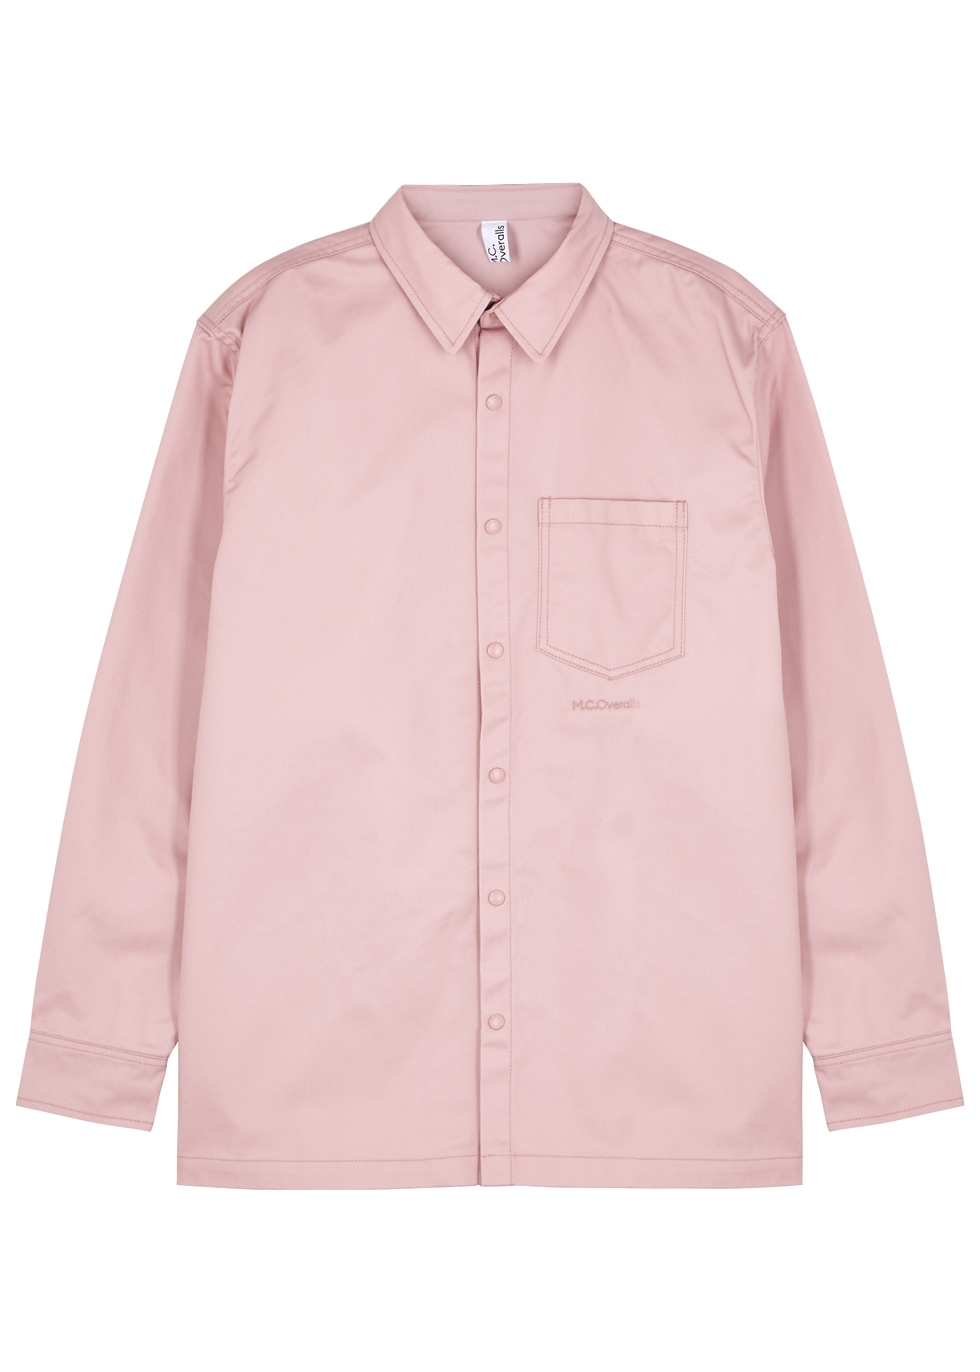 M.C. OVERALLS Dusky Pink Twill Shirt